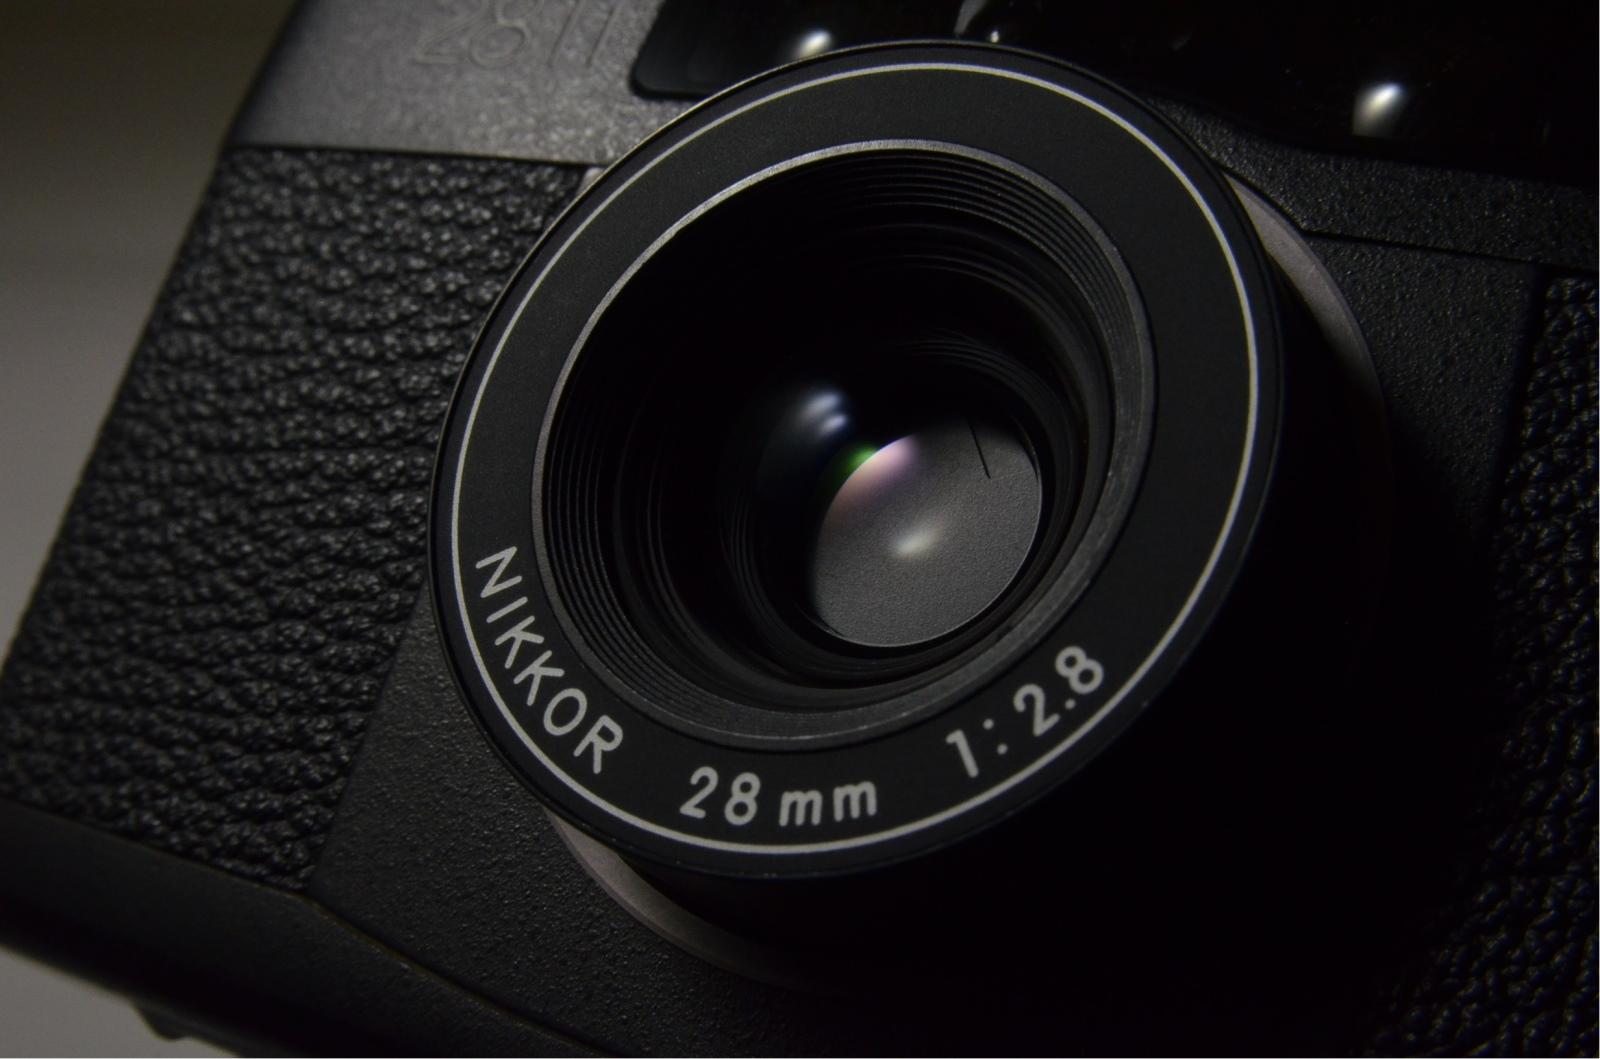 nikon 28ti 35mm point & shoot film camera